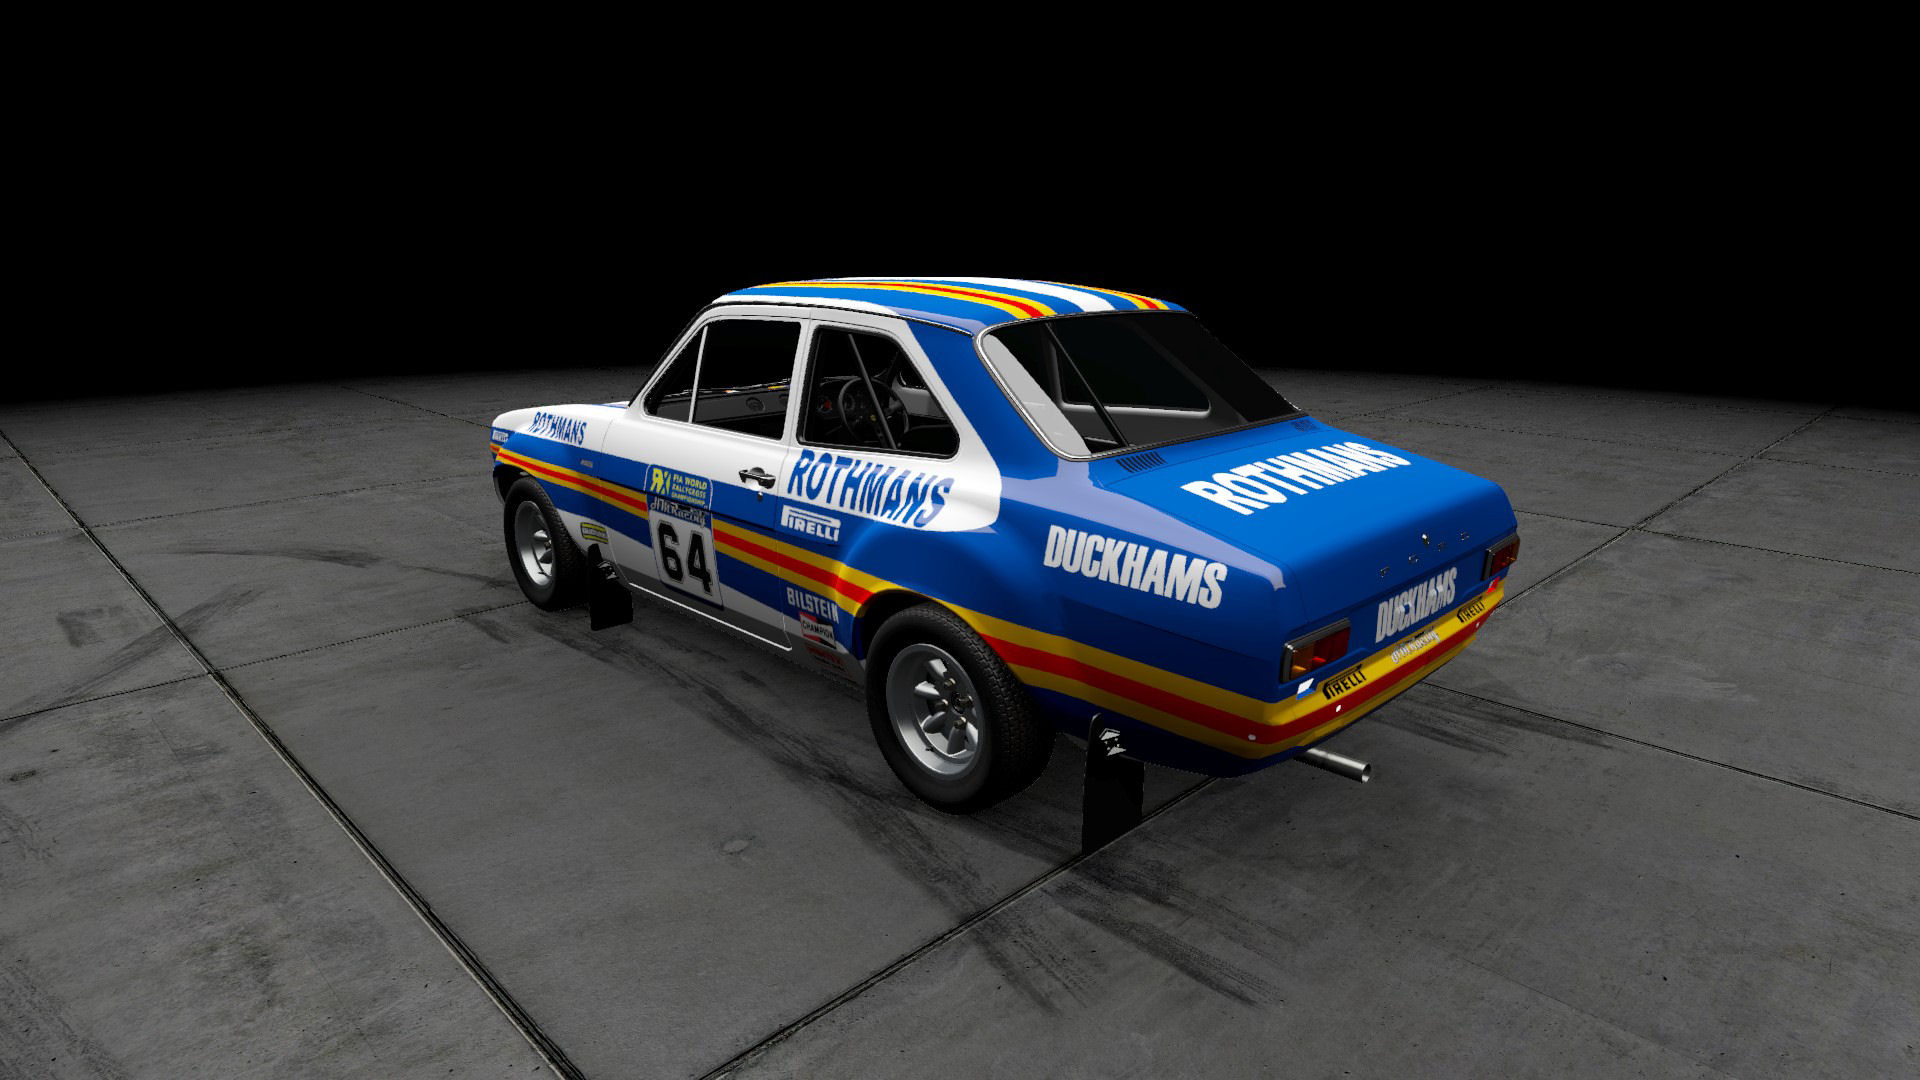 Ford Escort mk1 rx Rothmans 03.jpg